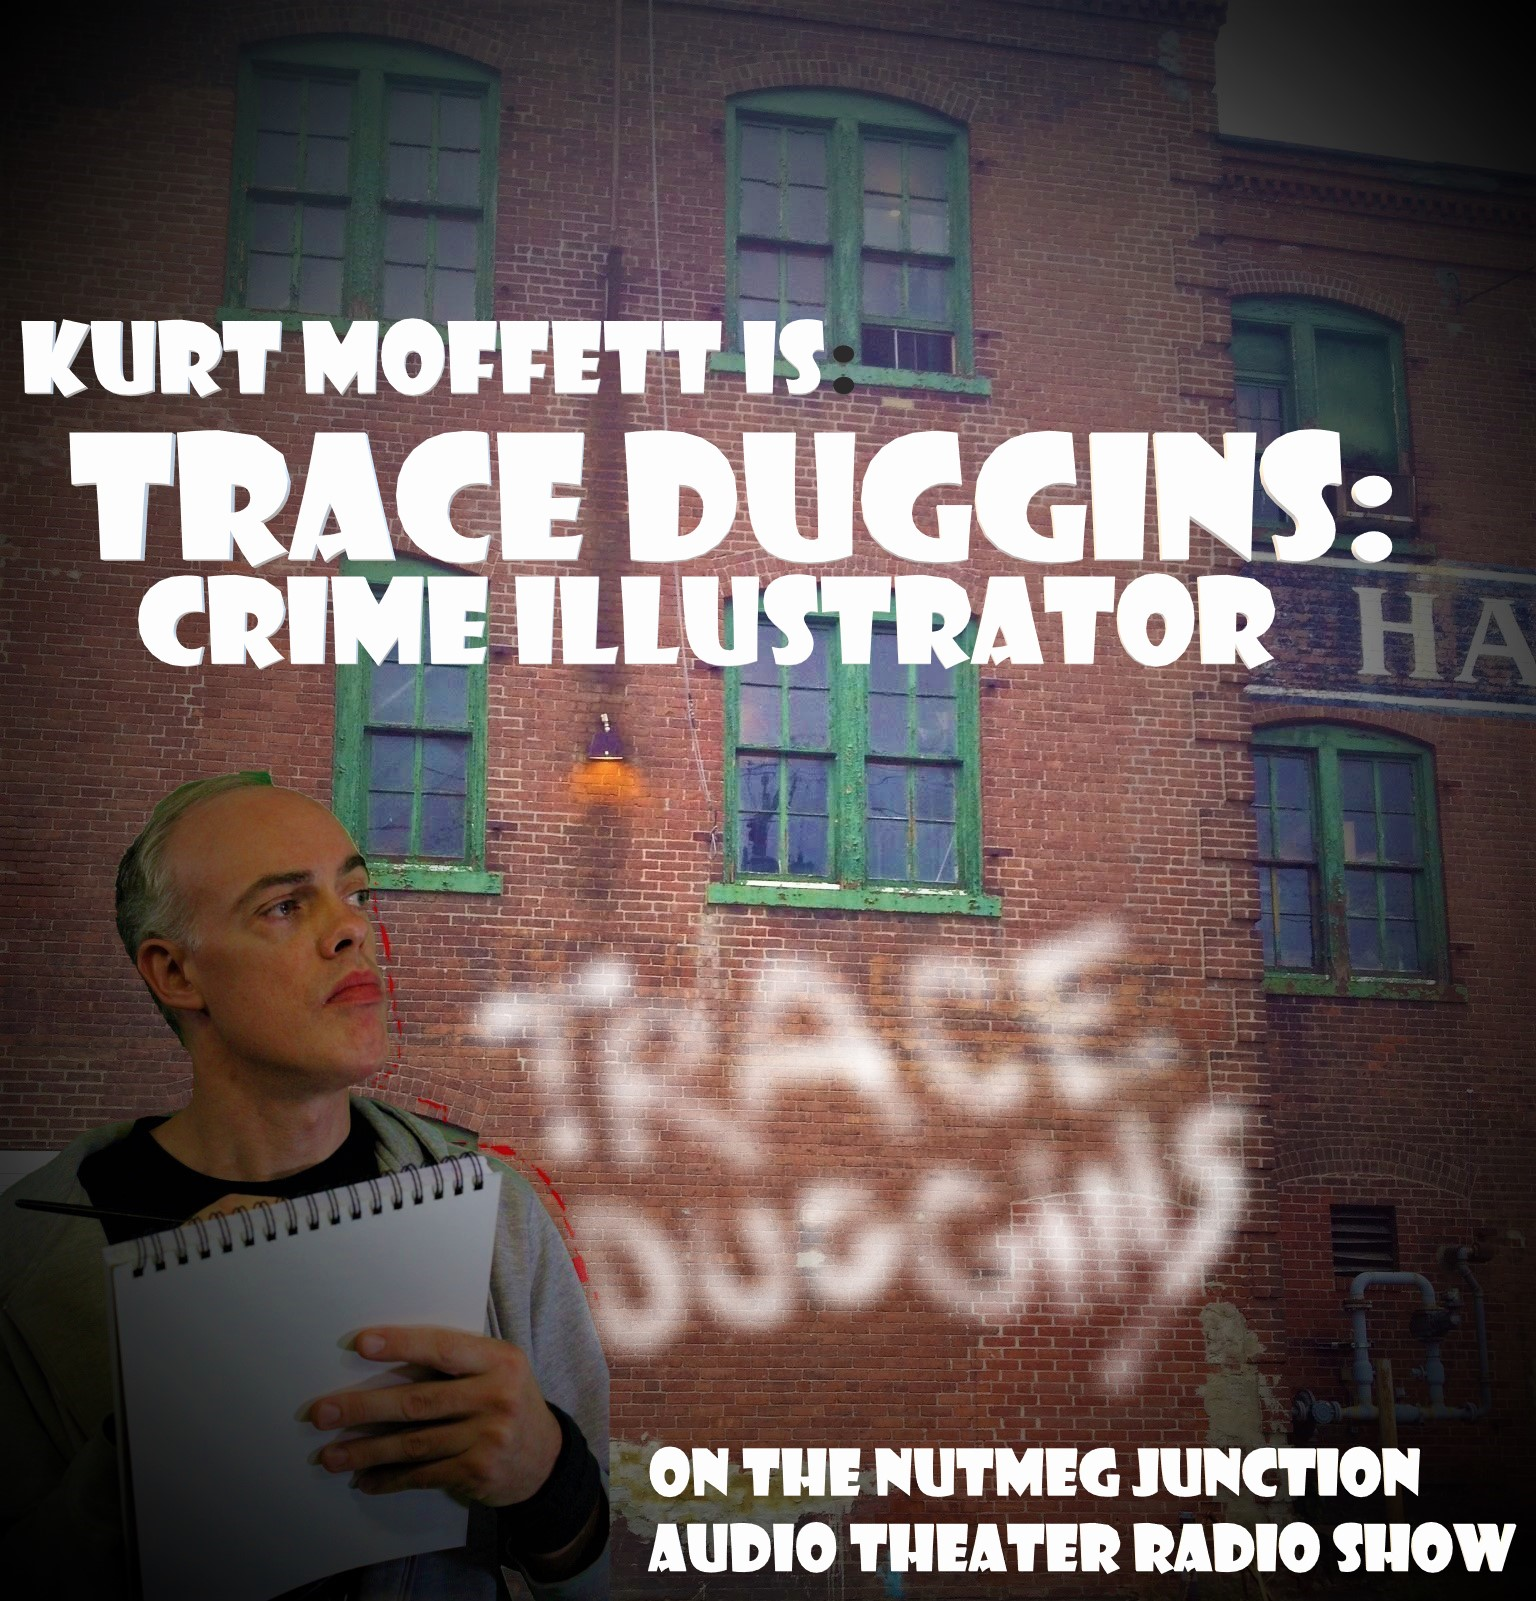 trace duggins